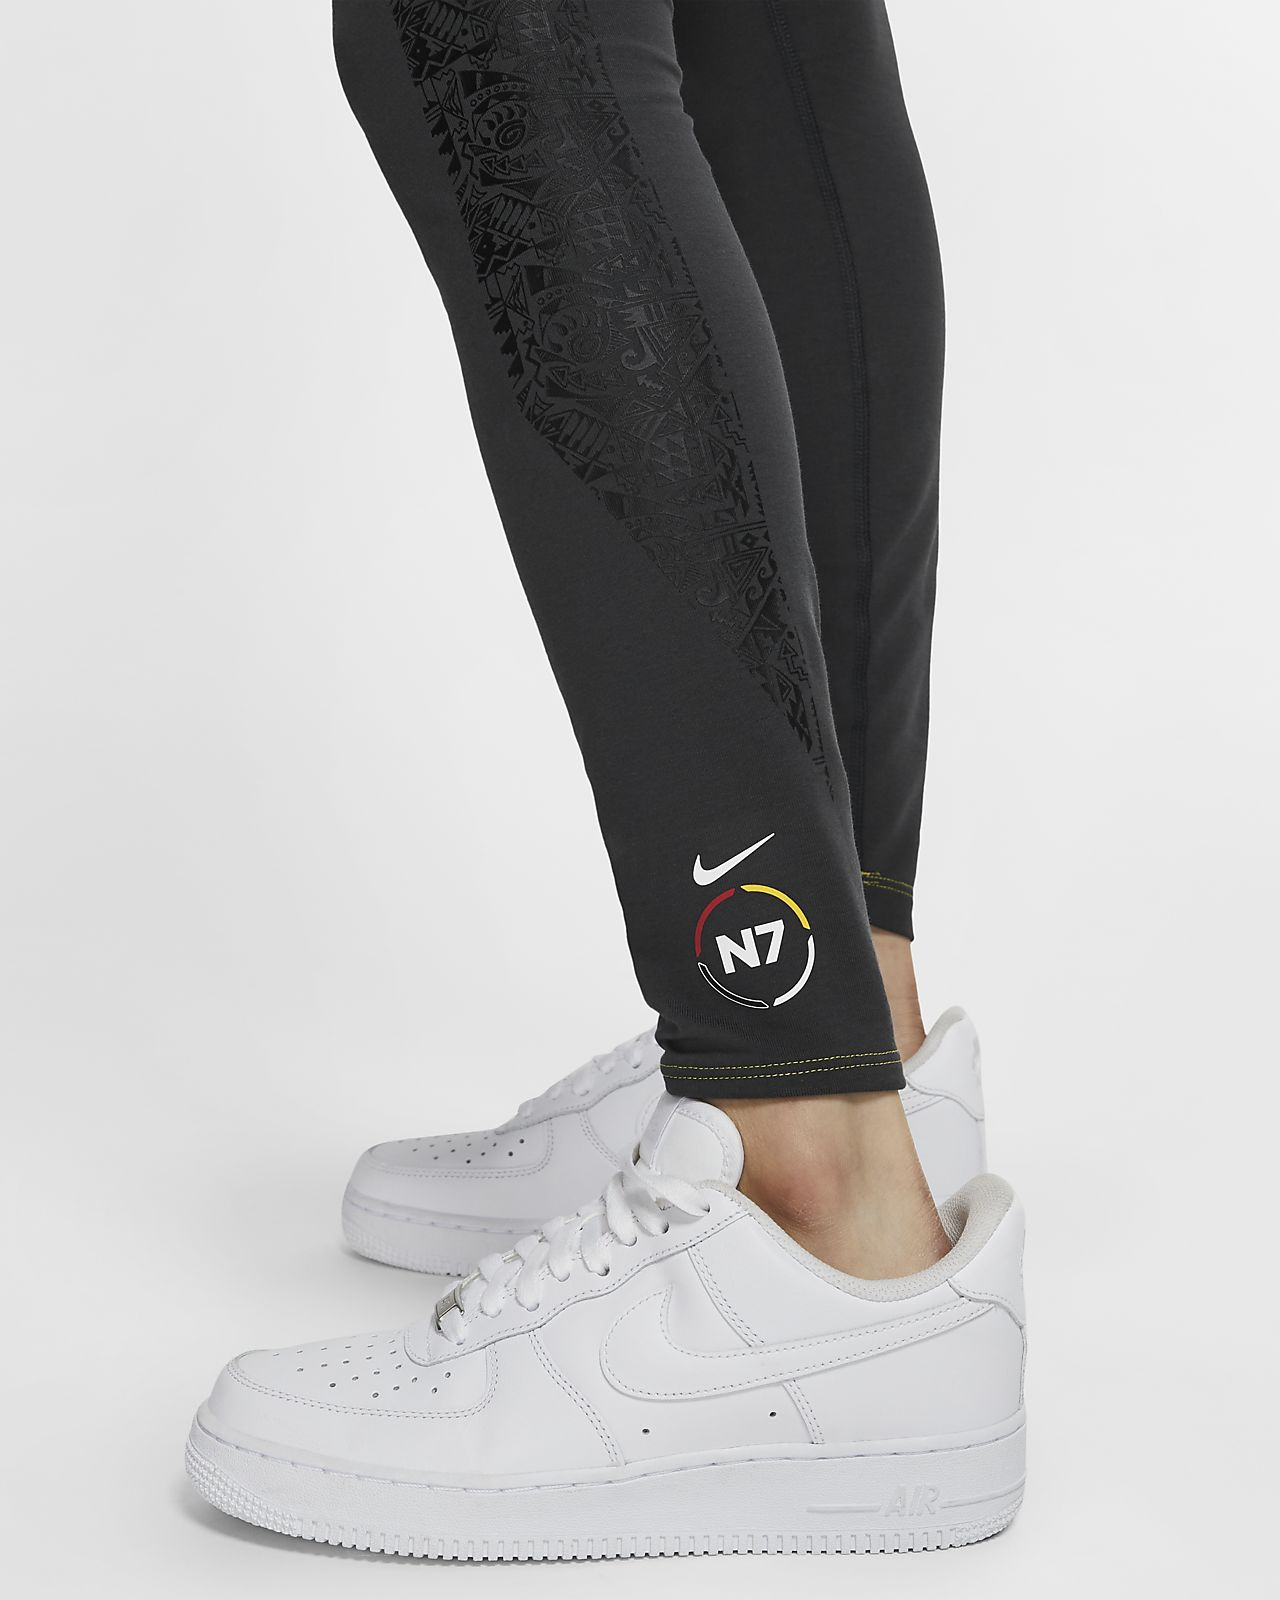 0ec1fdb9 Nike Sportswear N7 Leg-A-See Women's High-Waisted Tights